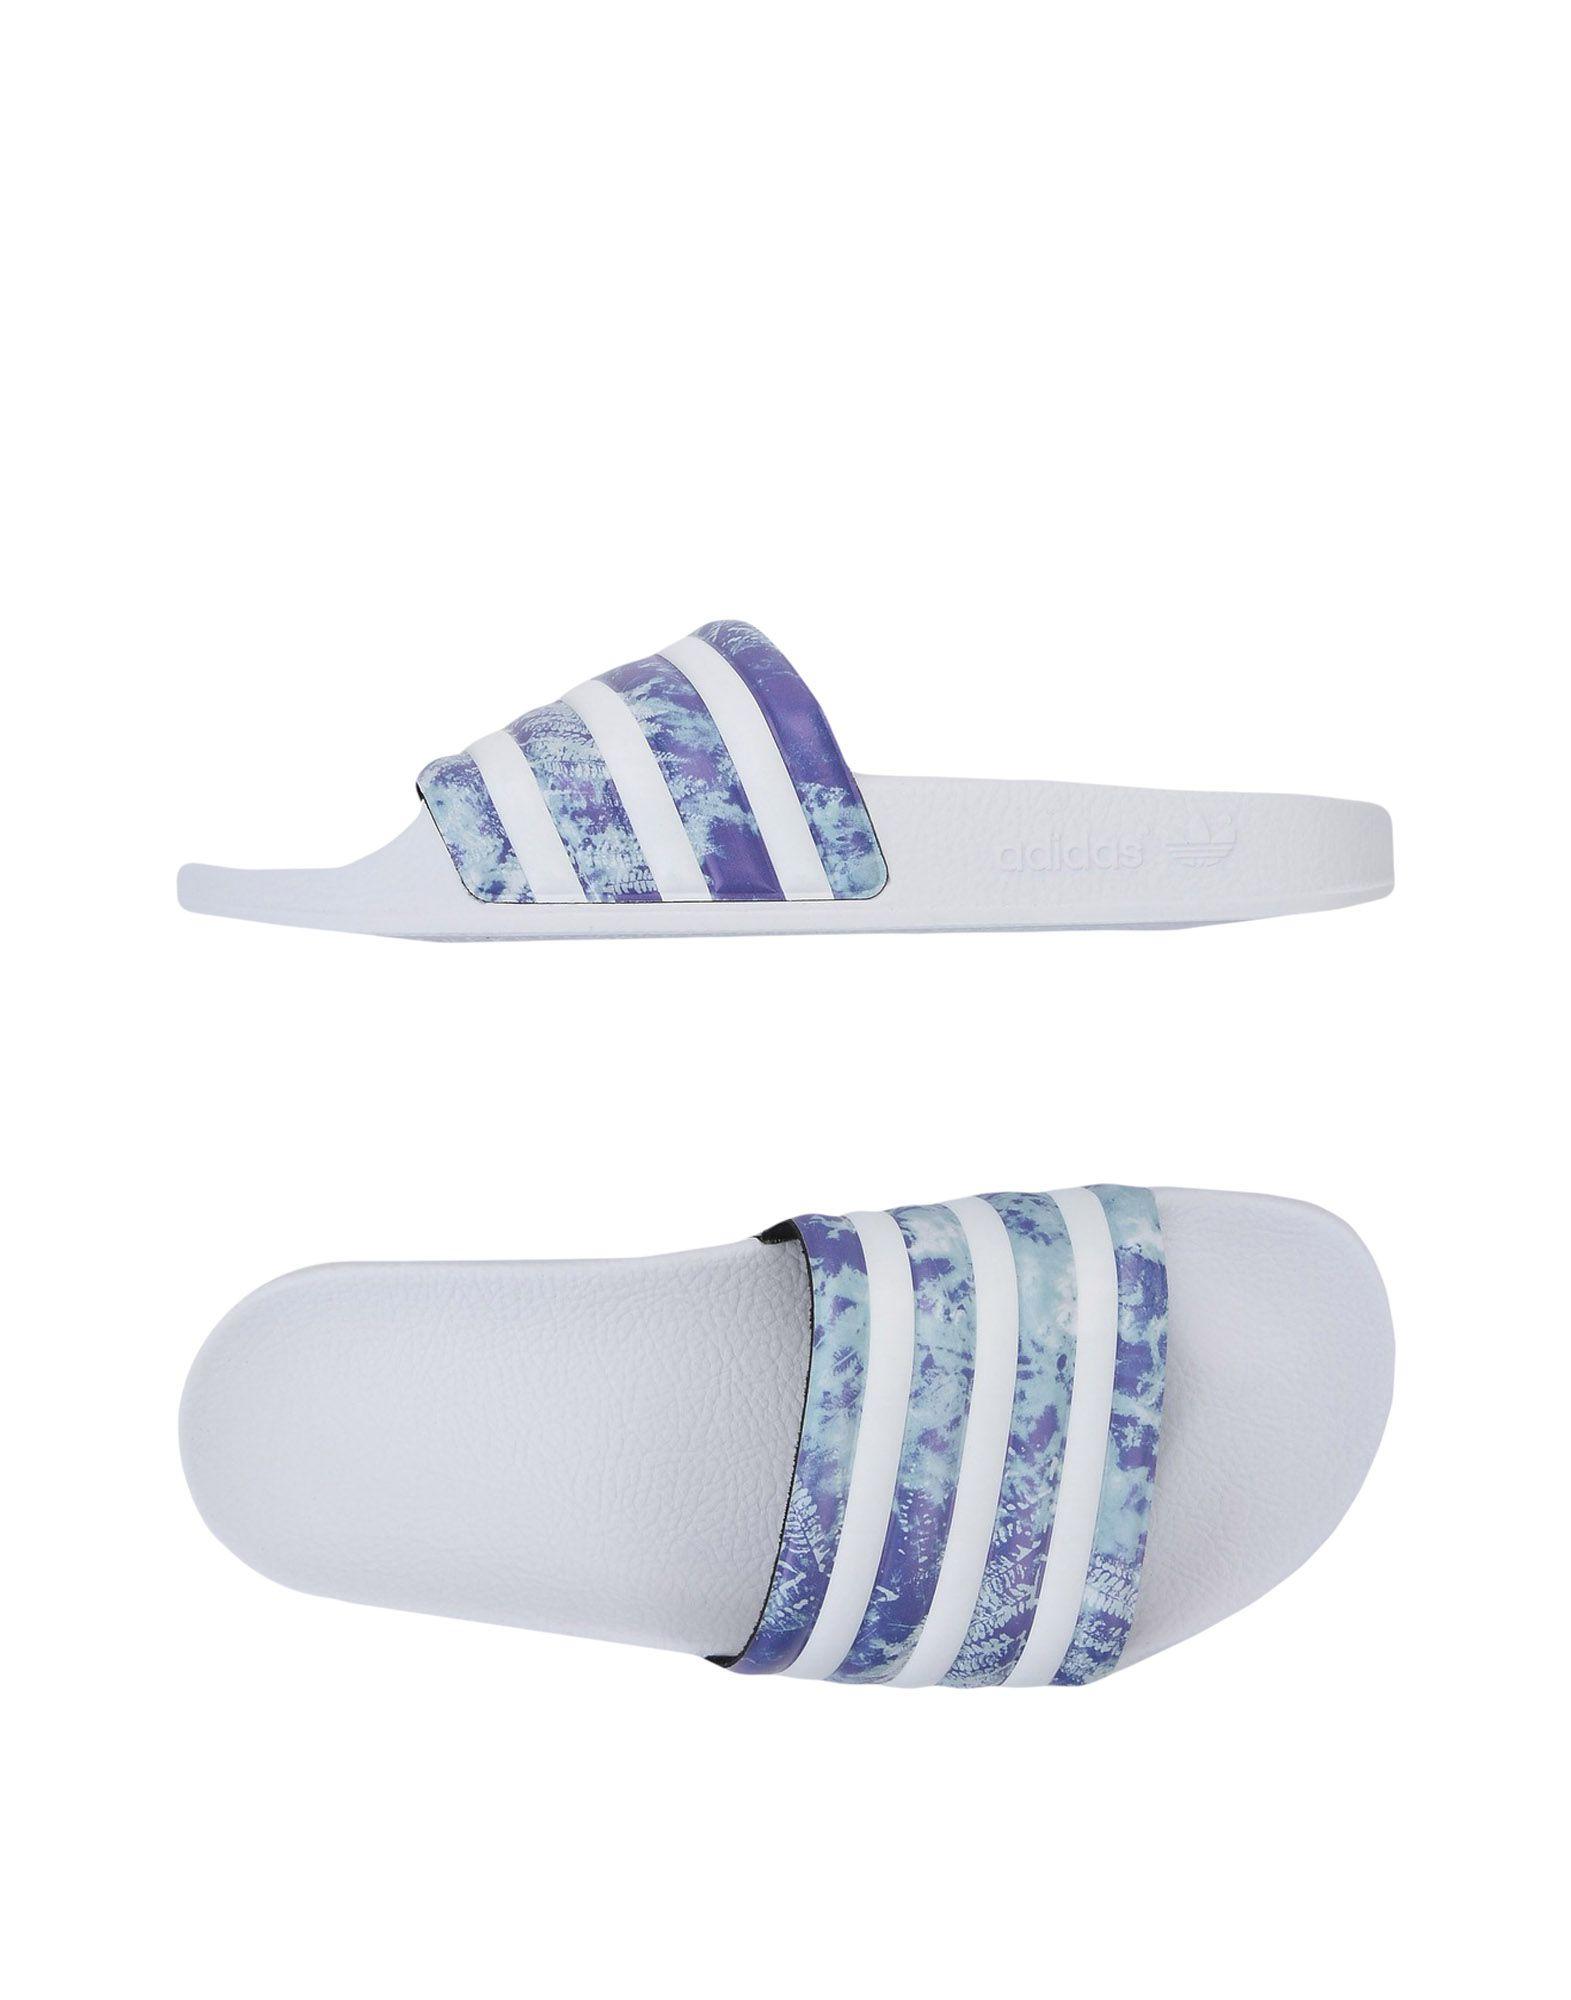 Ciabatte Adidas Originals Adilette W - Donna - 11269815HI